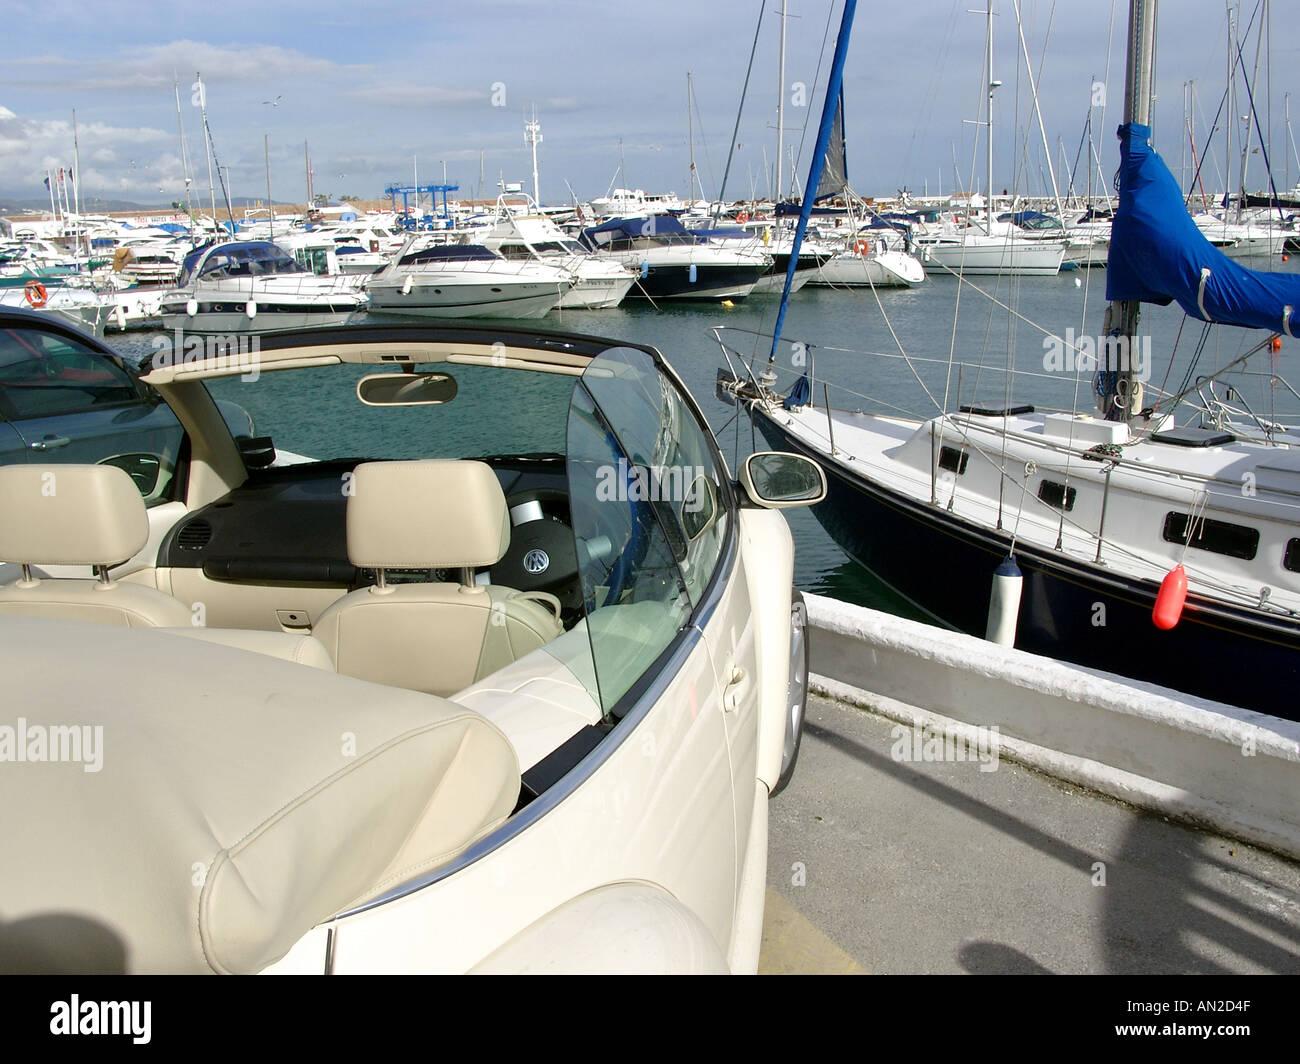 Volkswagen Beetle Convertible car and boats Puerto Banus Costa del Sol Spain - Stock Image